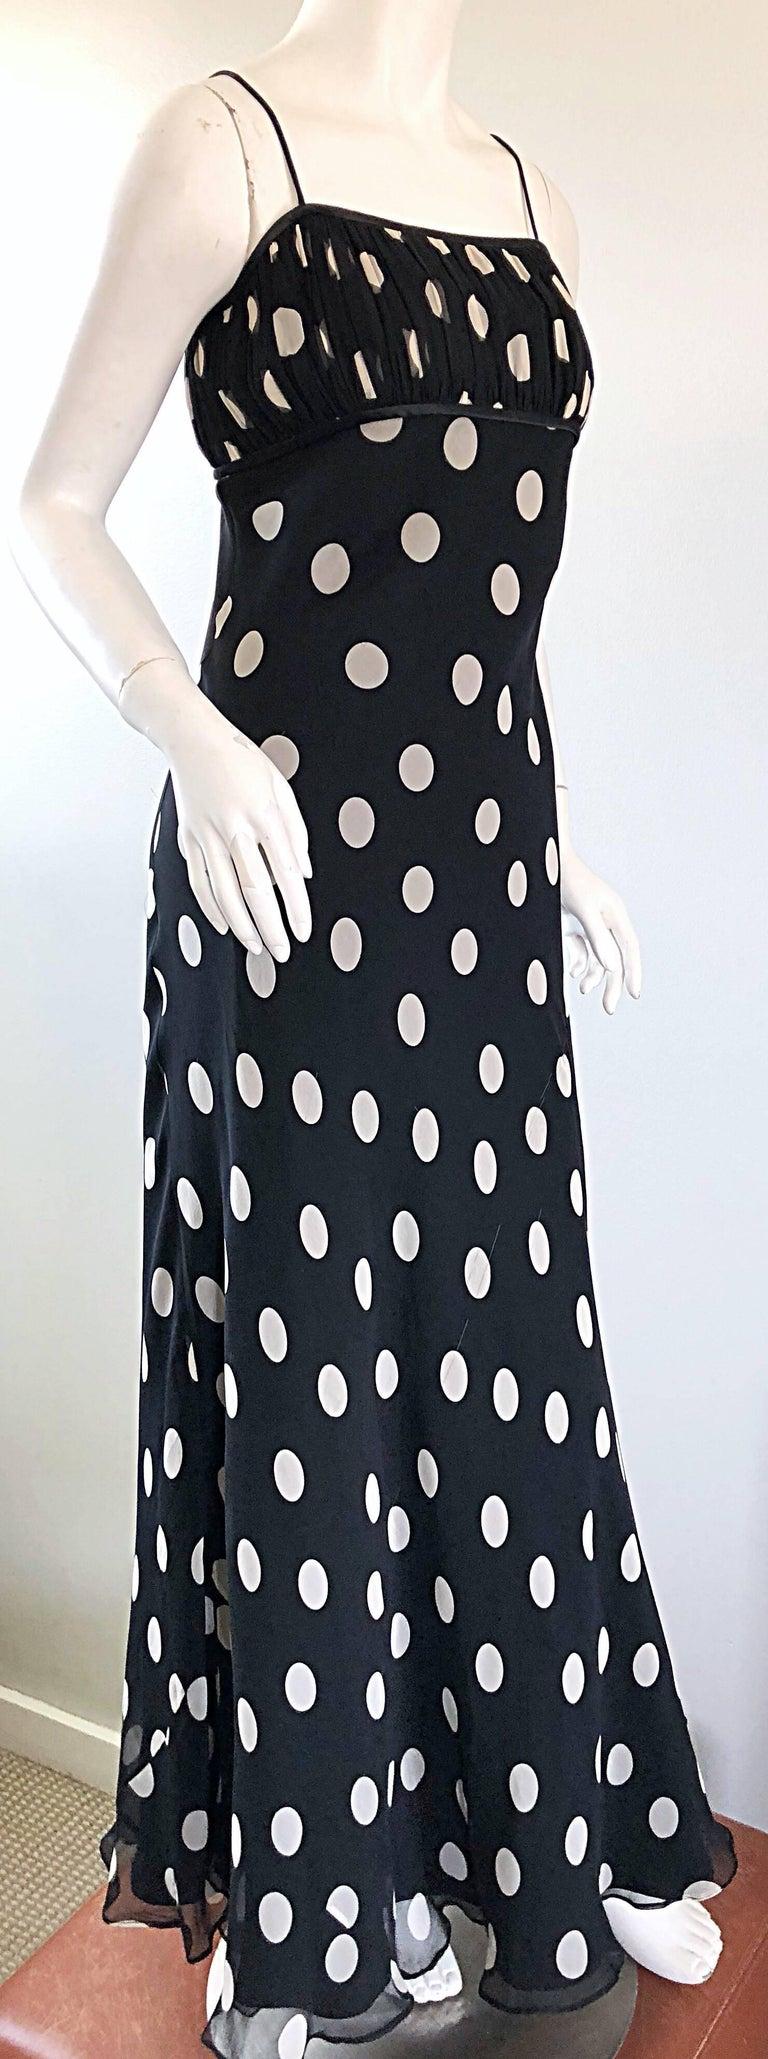 1990s Abriele Melano Black and White Polka Dot Silk Chiffon Maxi Dress 90s Gown For Sale 2